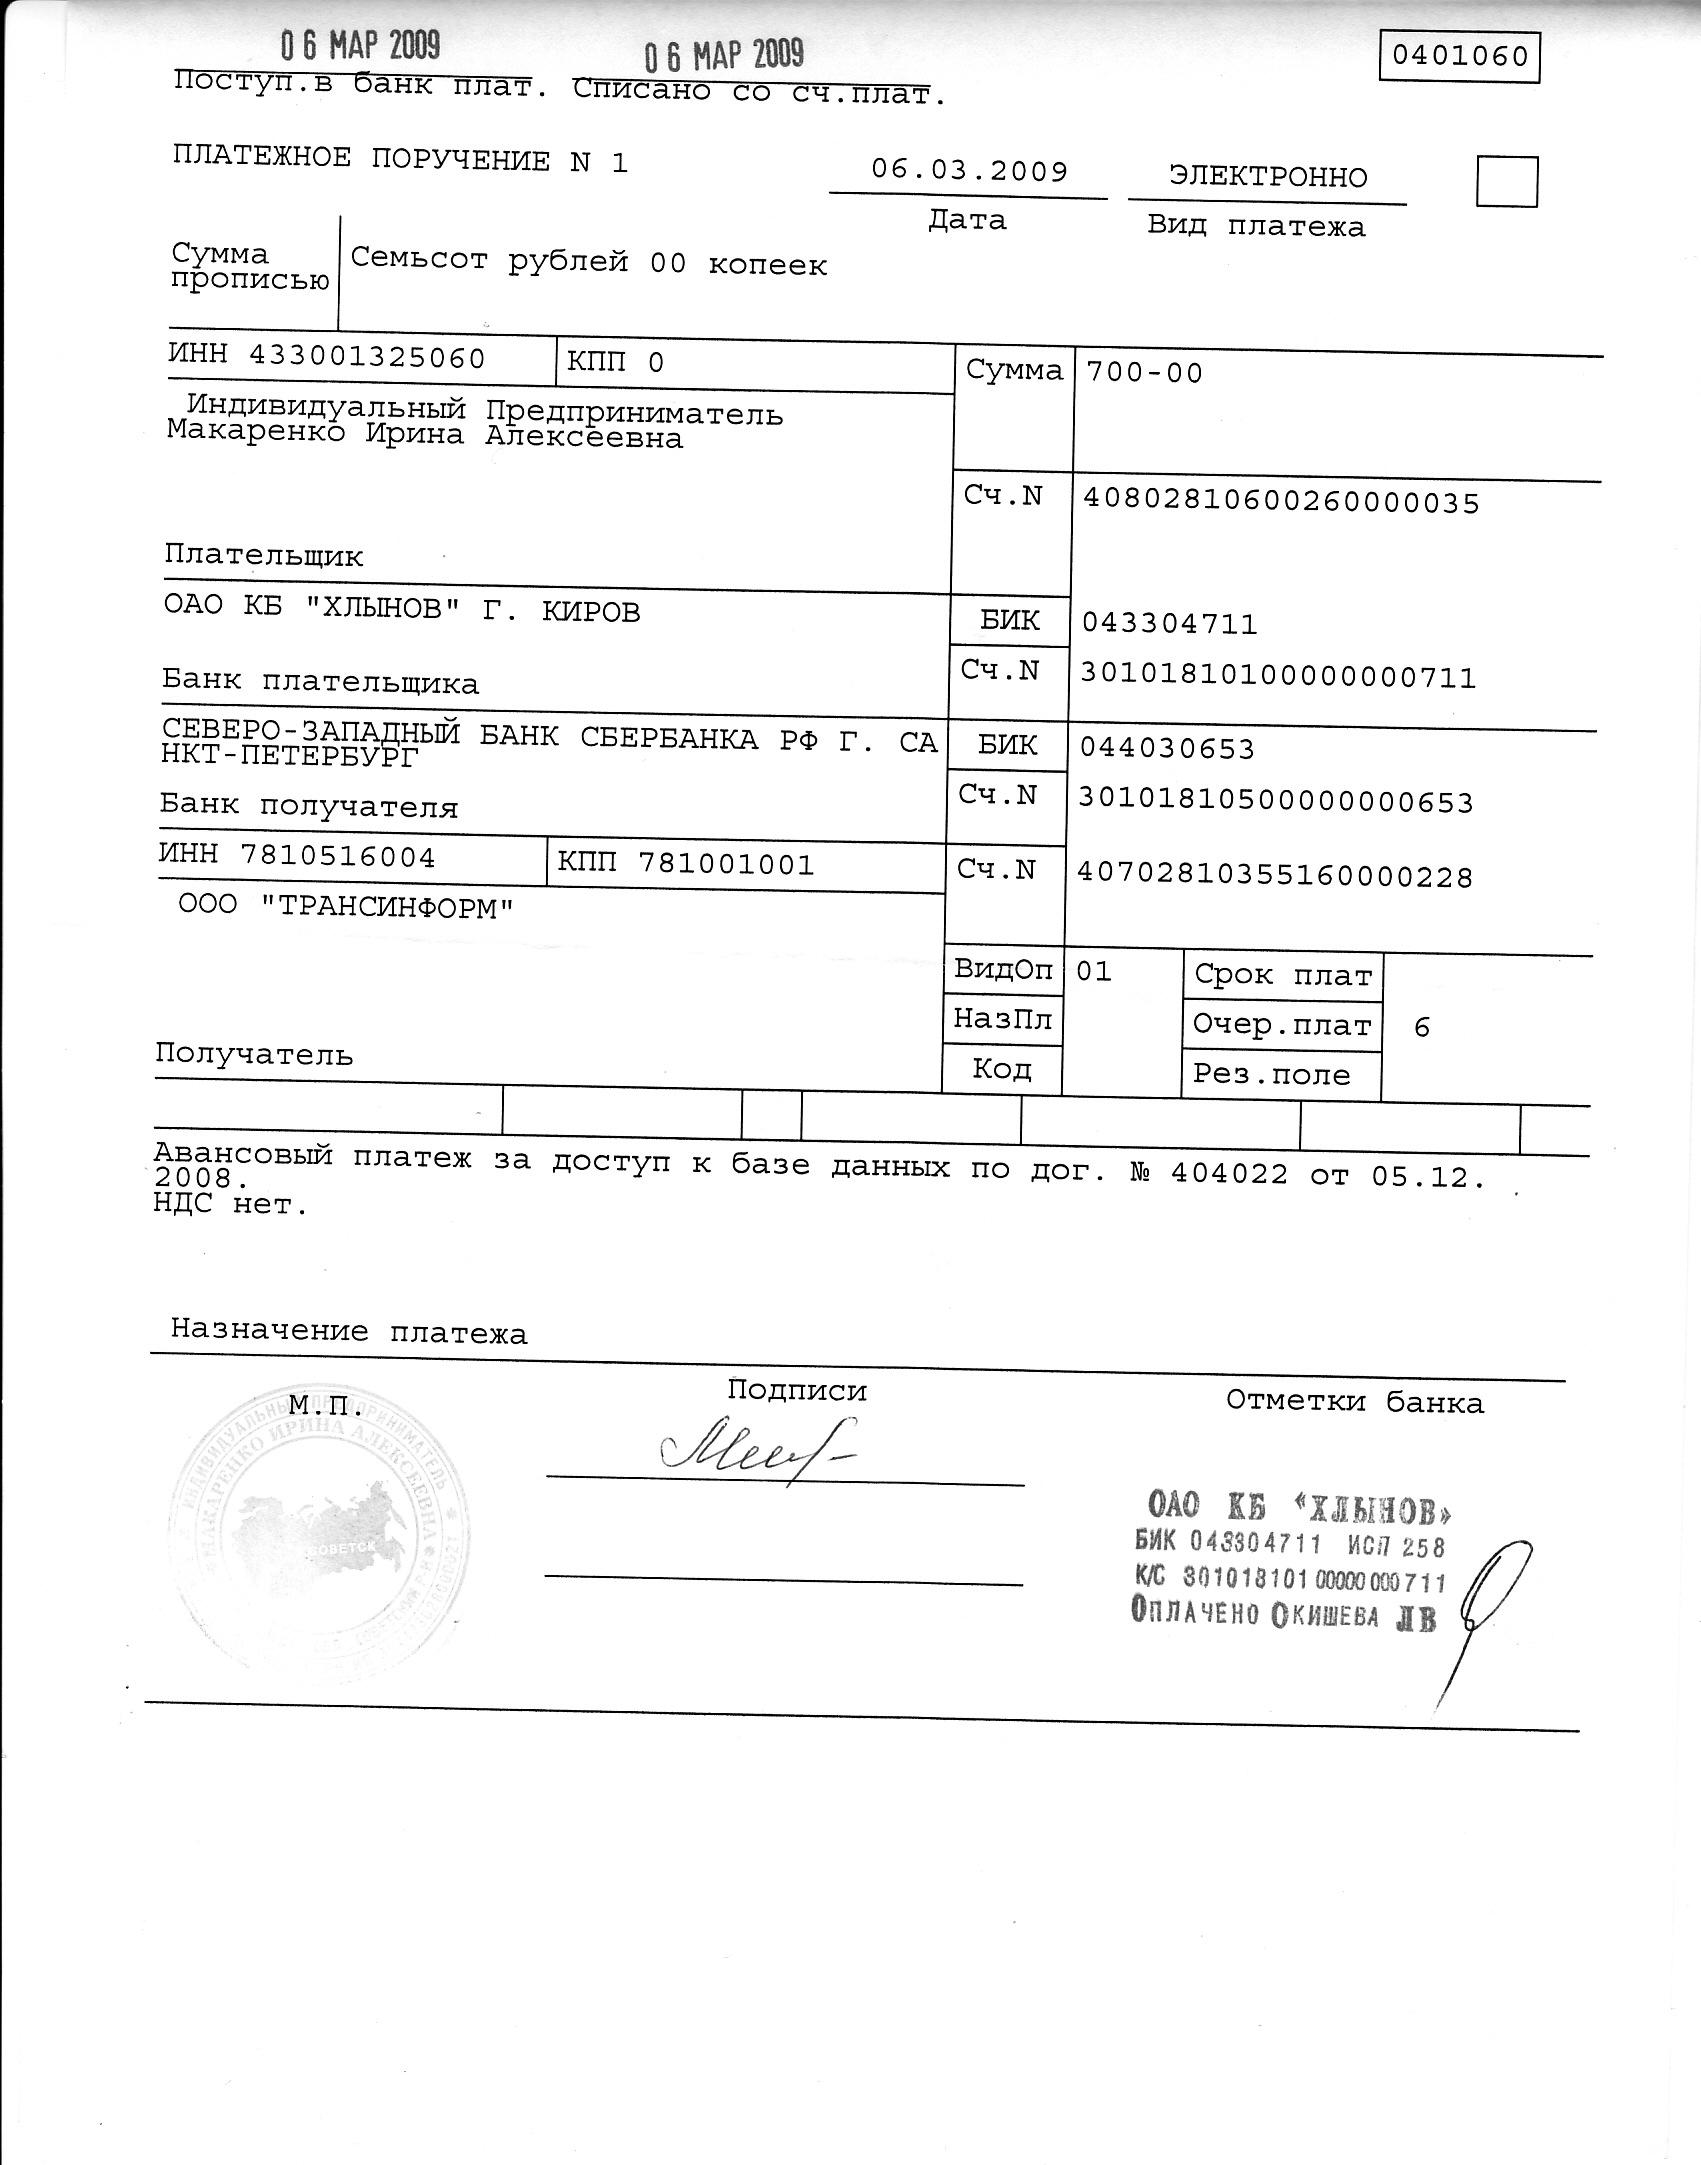 http://files.ati.su/Documents/167221/449.jpg